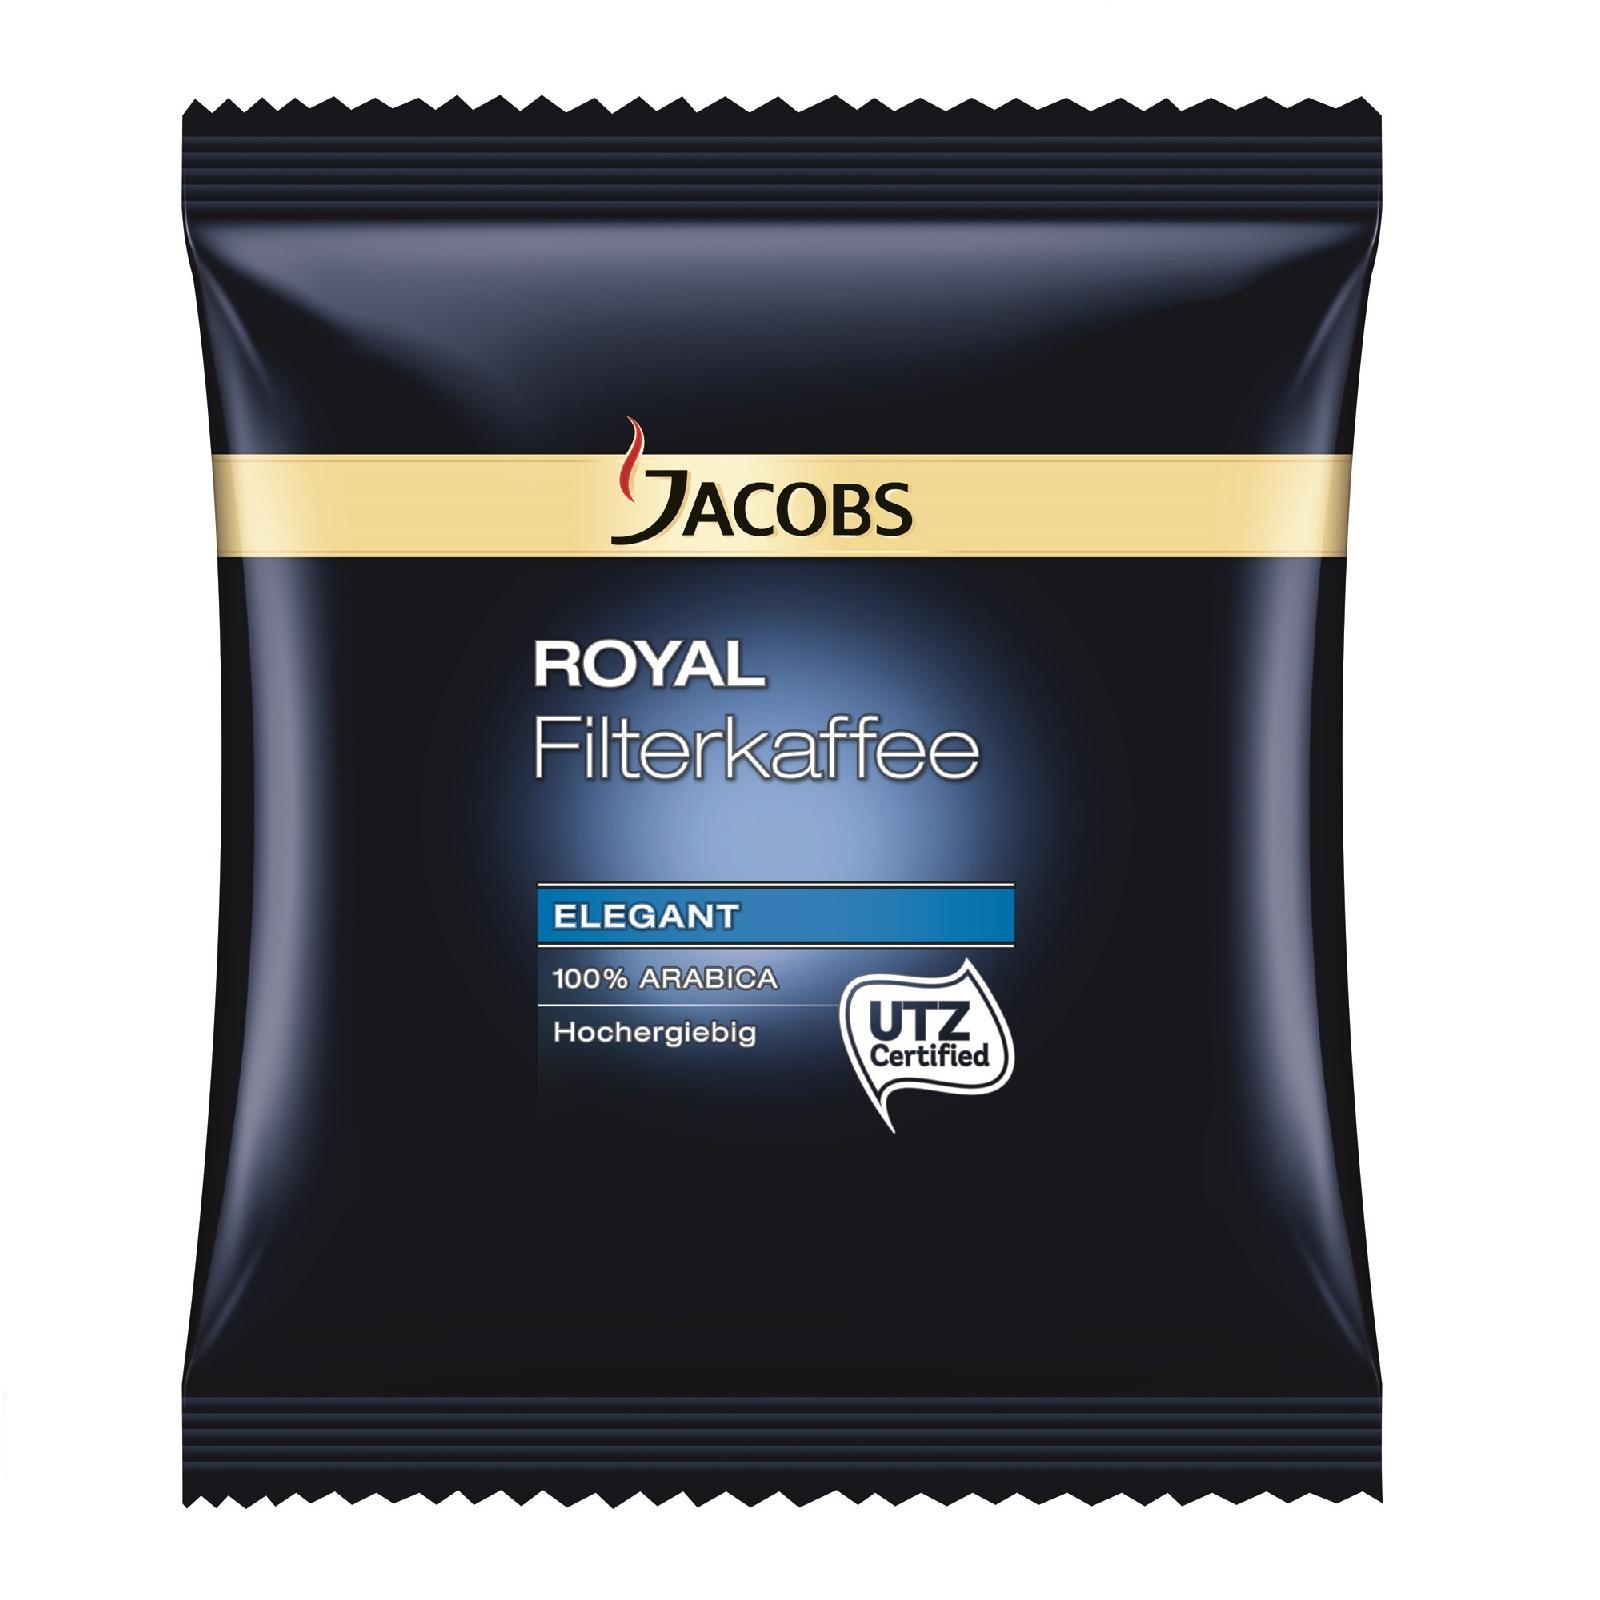 Jacobs Royal Elegant Filterkaffee 80 x 60g Kaffee gemahlen